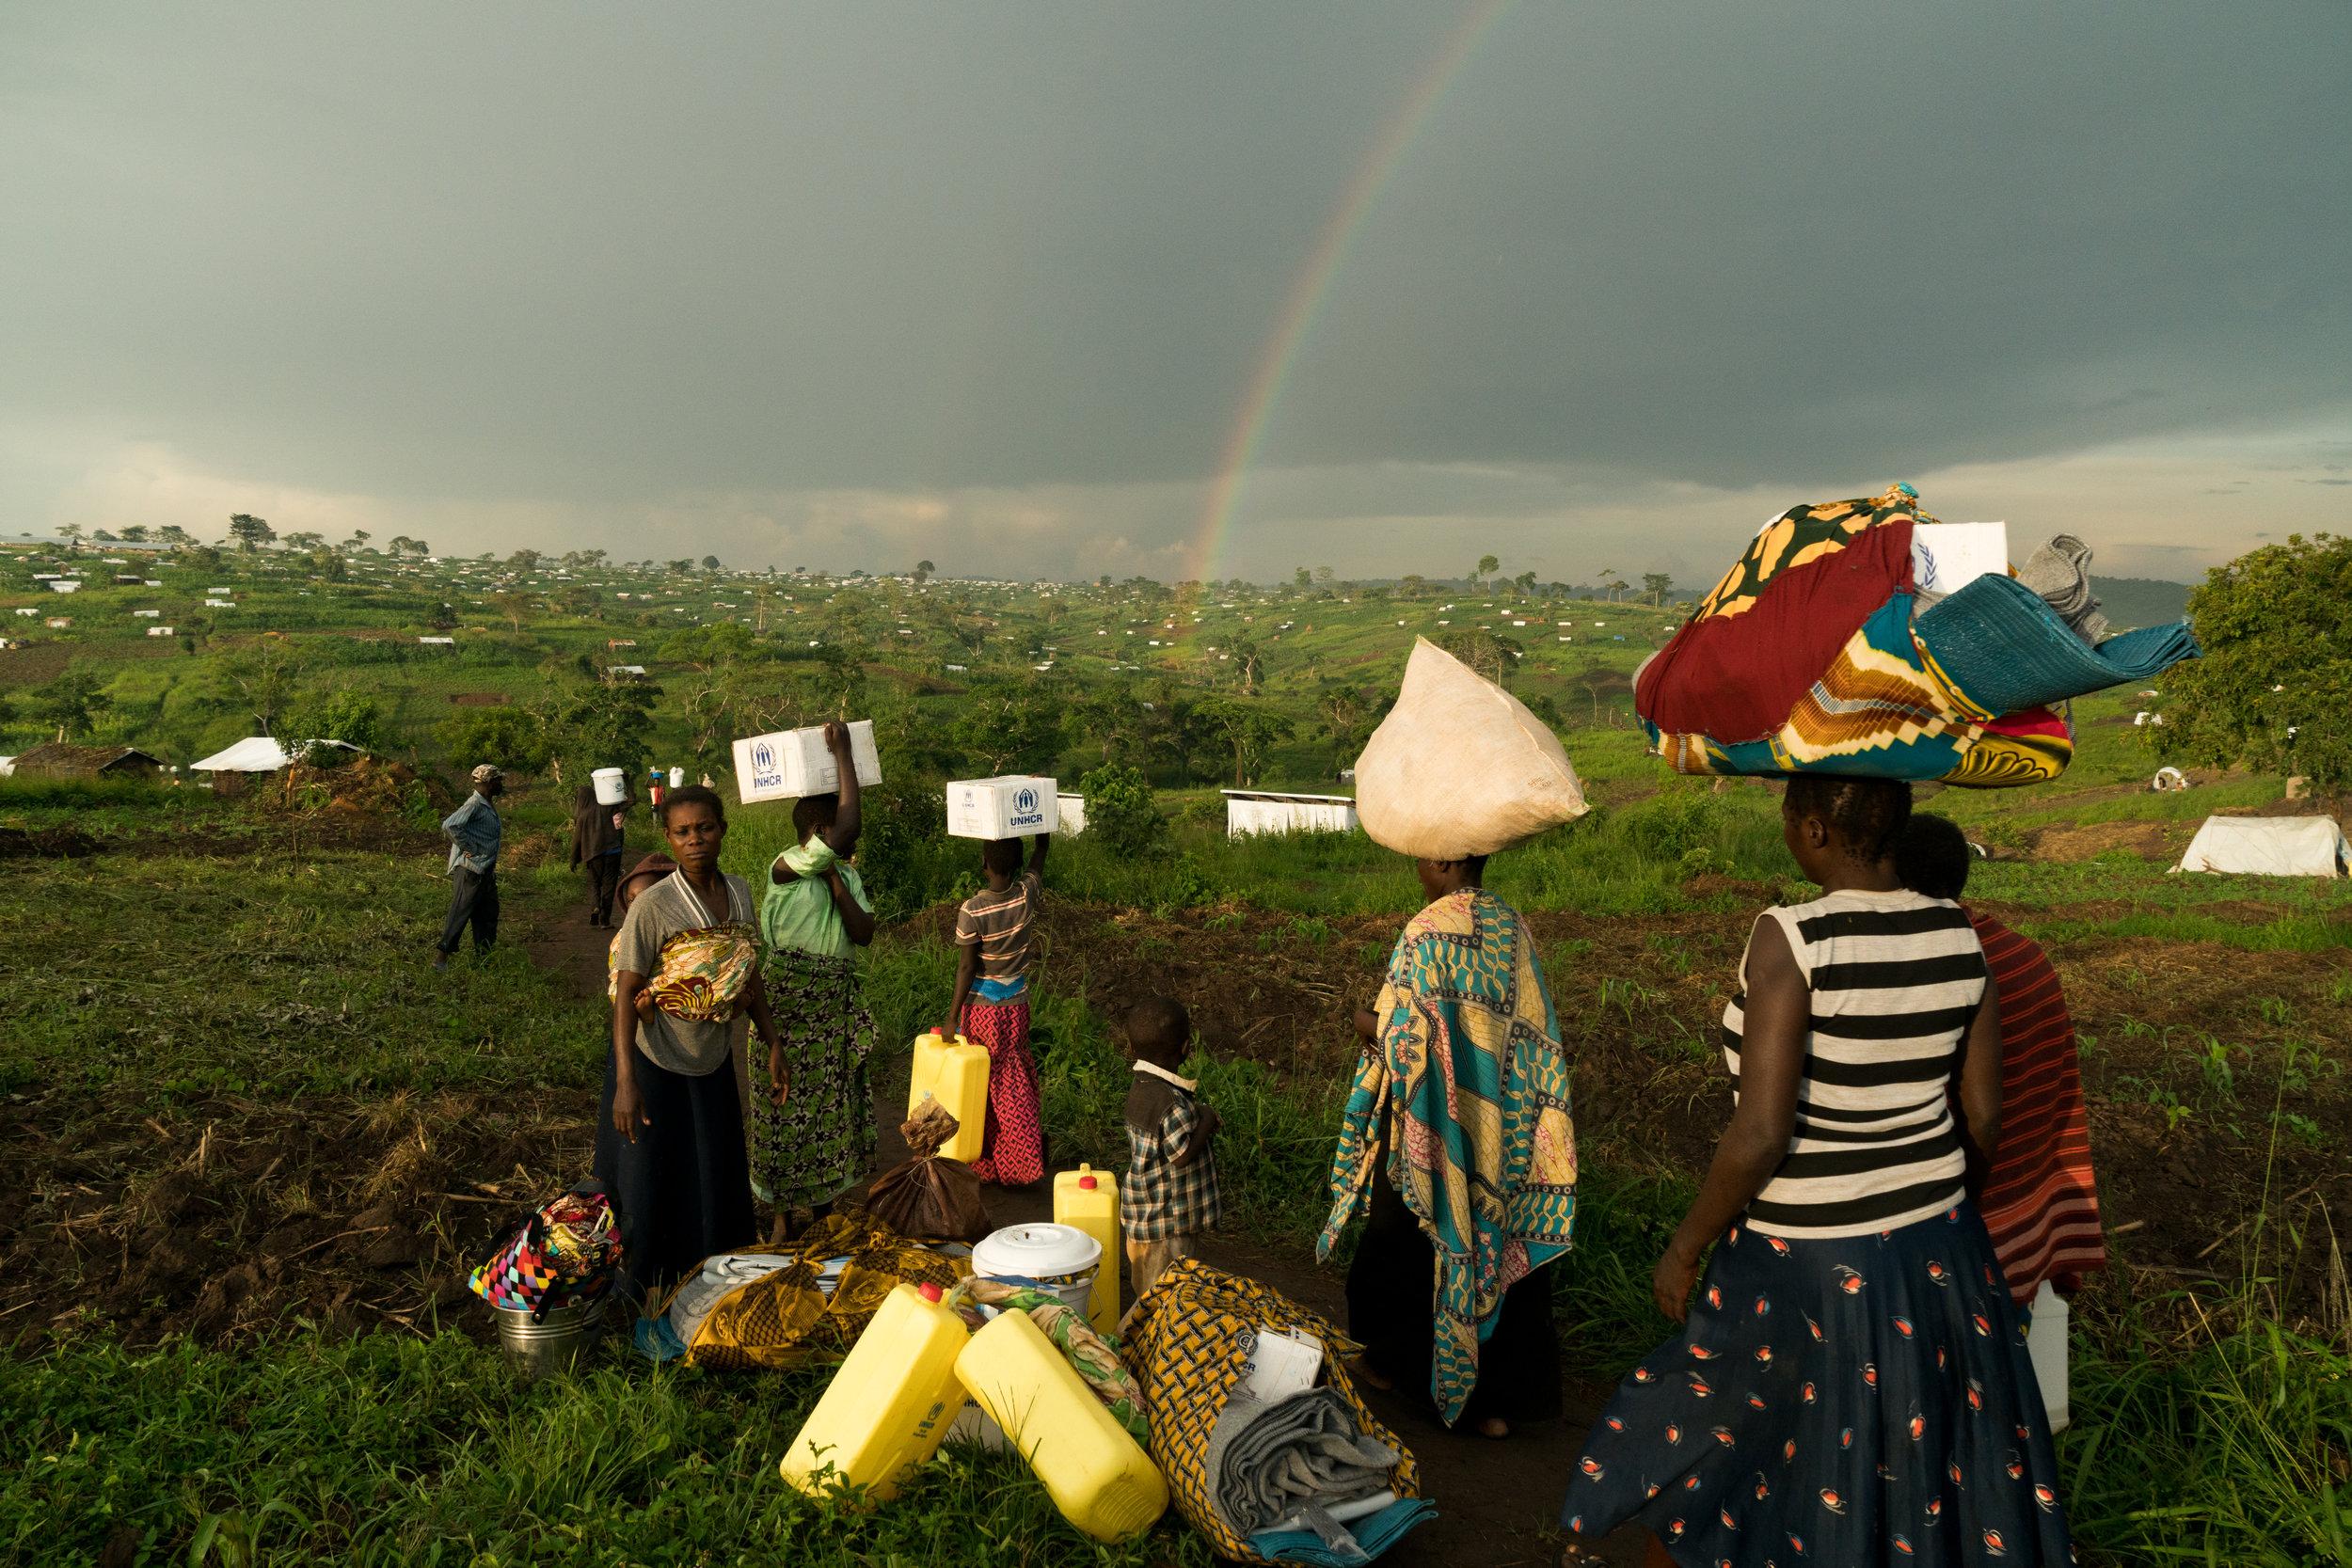 Ohanesian_Uganda_DSC03400.jpg